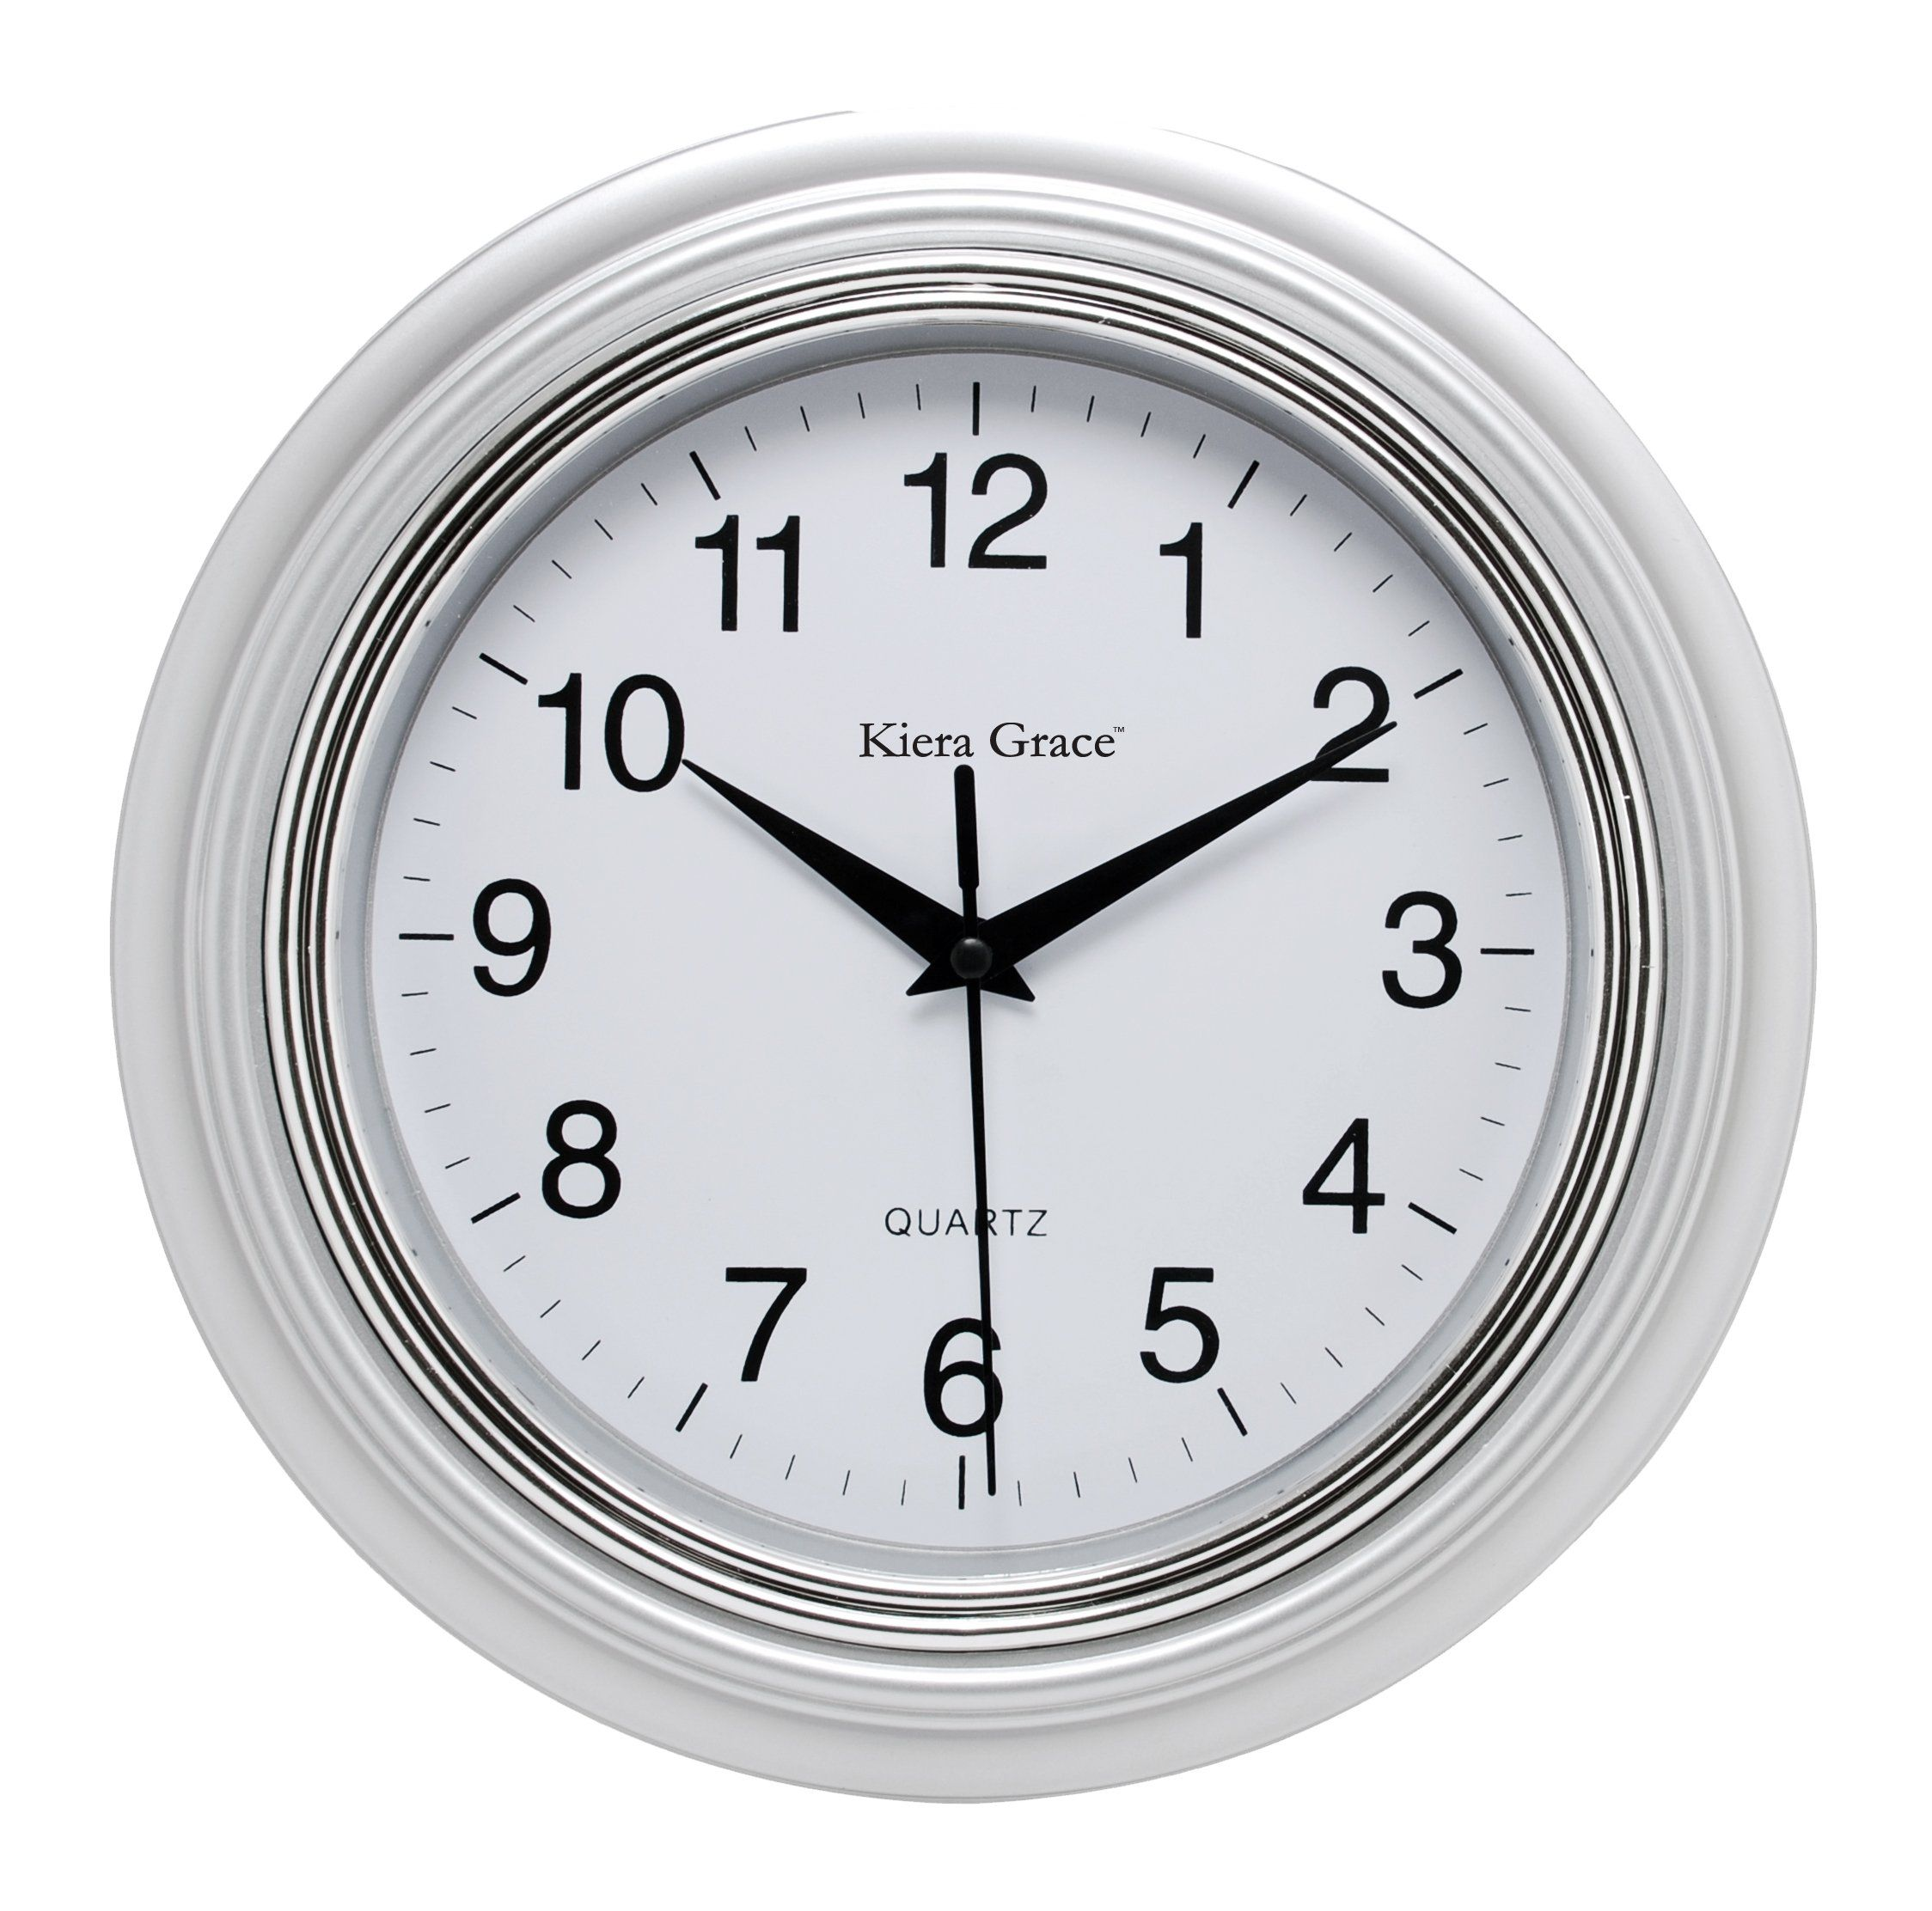 Kieragrace Traditional Wall Clocks 10 Inch Silver In 2020 Wanduhr Wanduhren Uhr